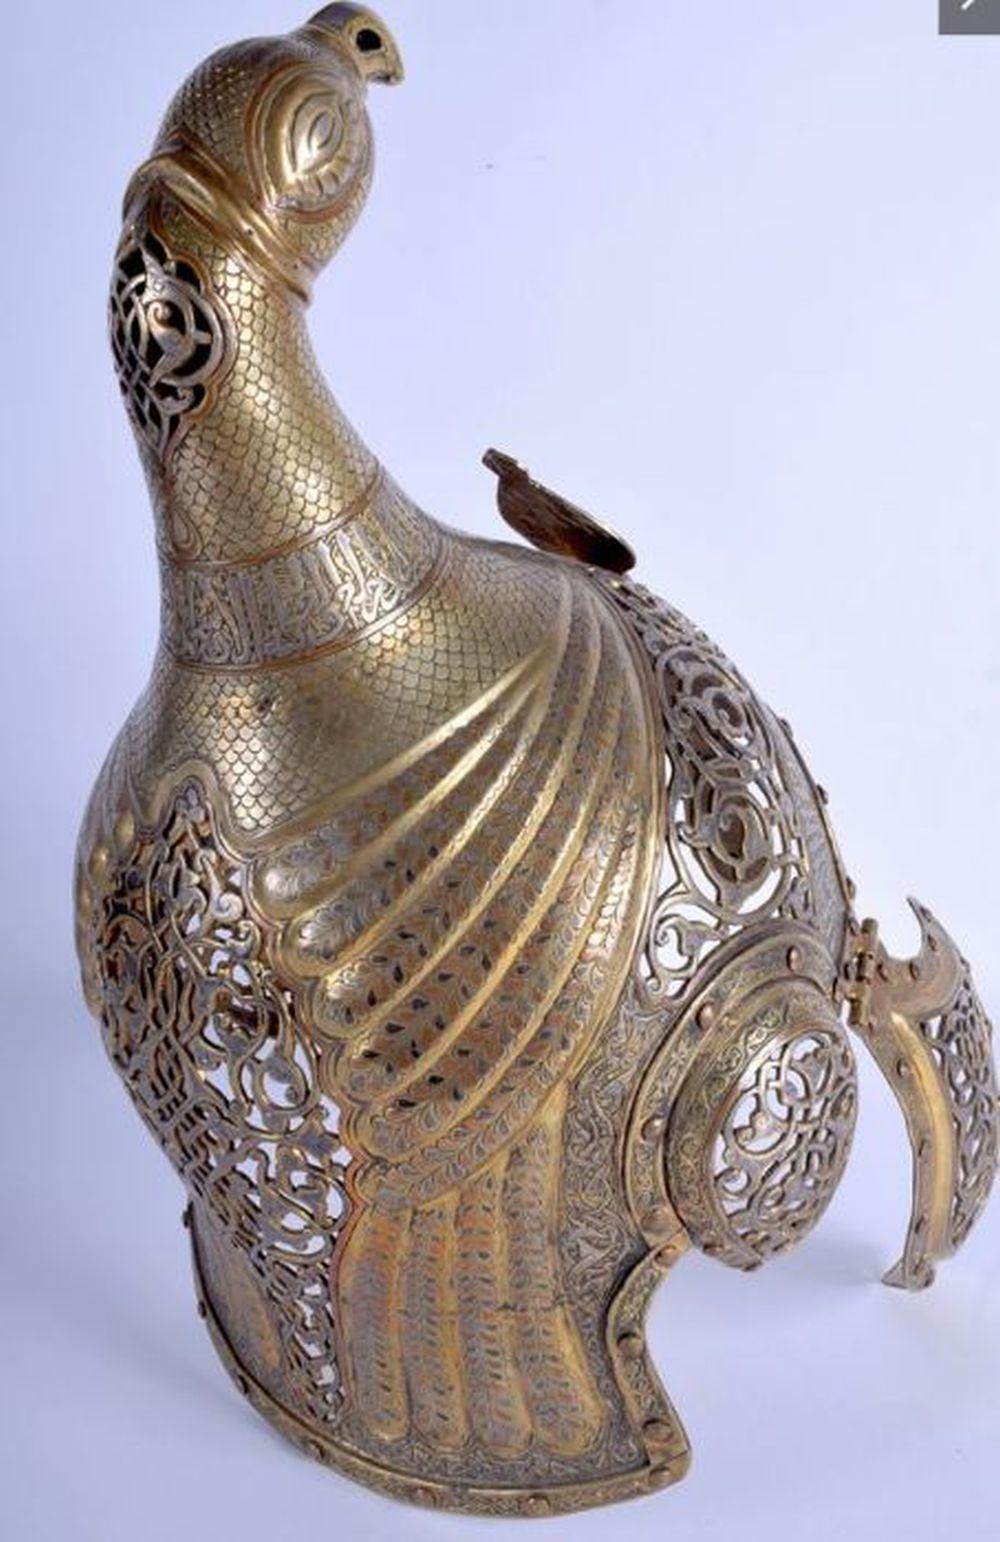 19th Century Central Asian Islamic Helmet Open Foliage & Kufic Script Calligraphic Inscriptions